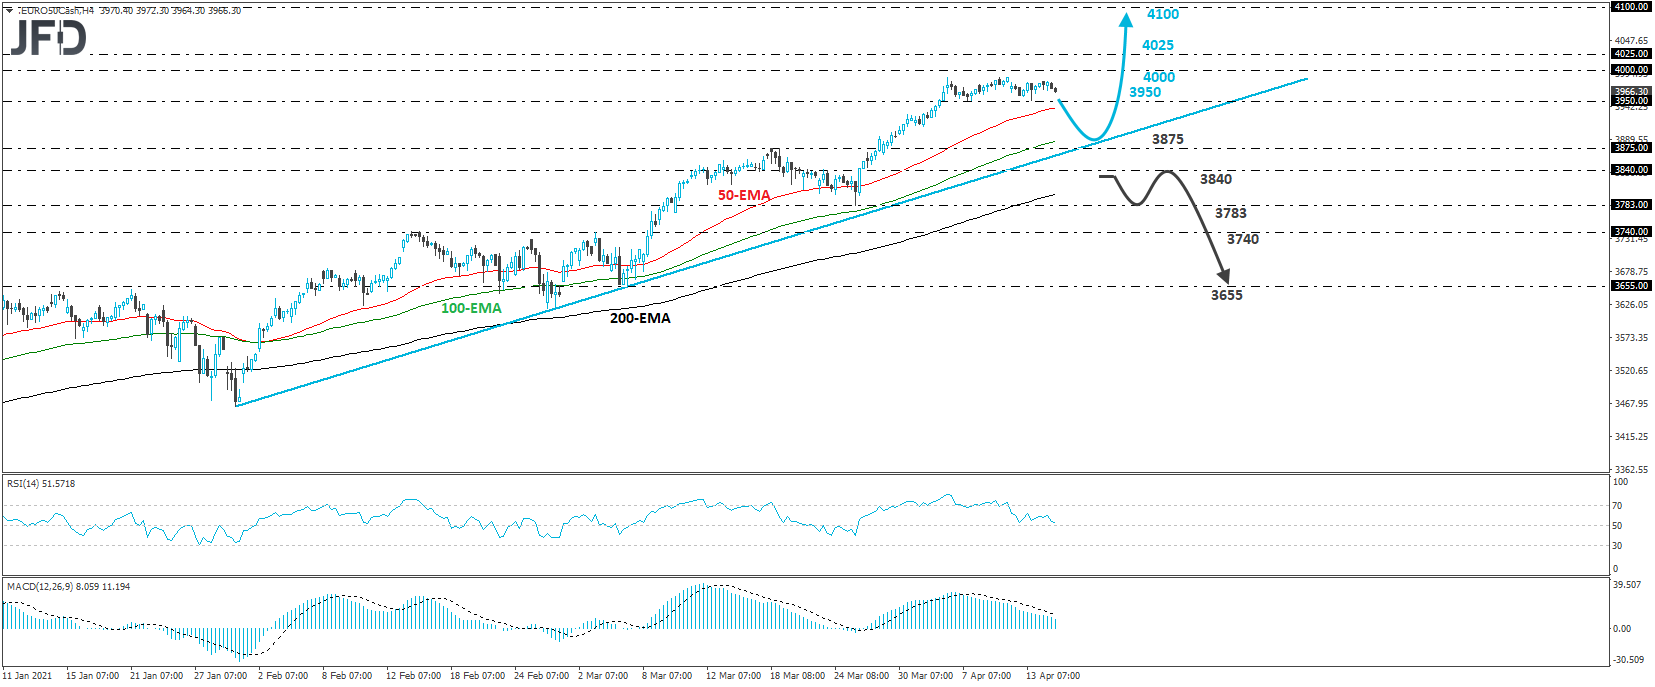 Euro stoxx 50 cash index 4-hour chart technical analysis